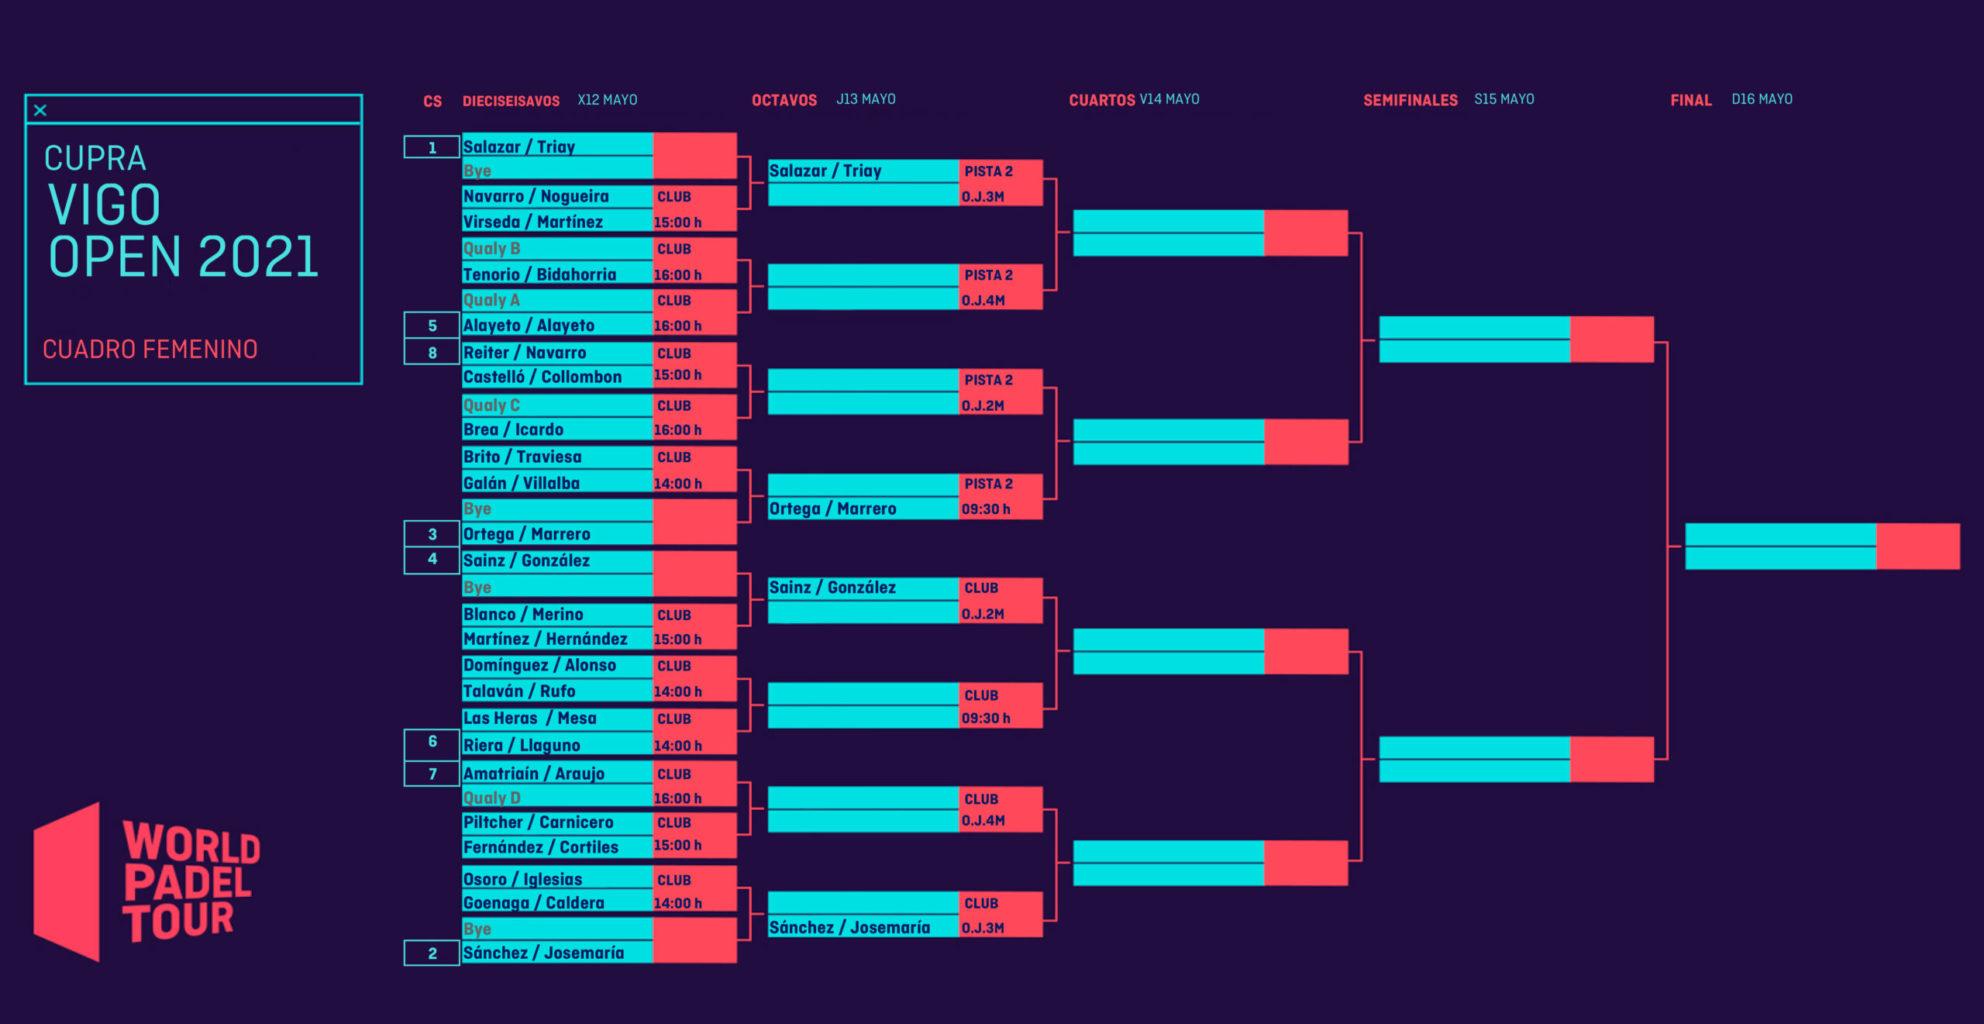 Cuadro final femenino del Cupra Vigo Open 2021